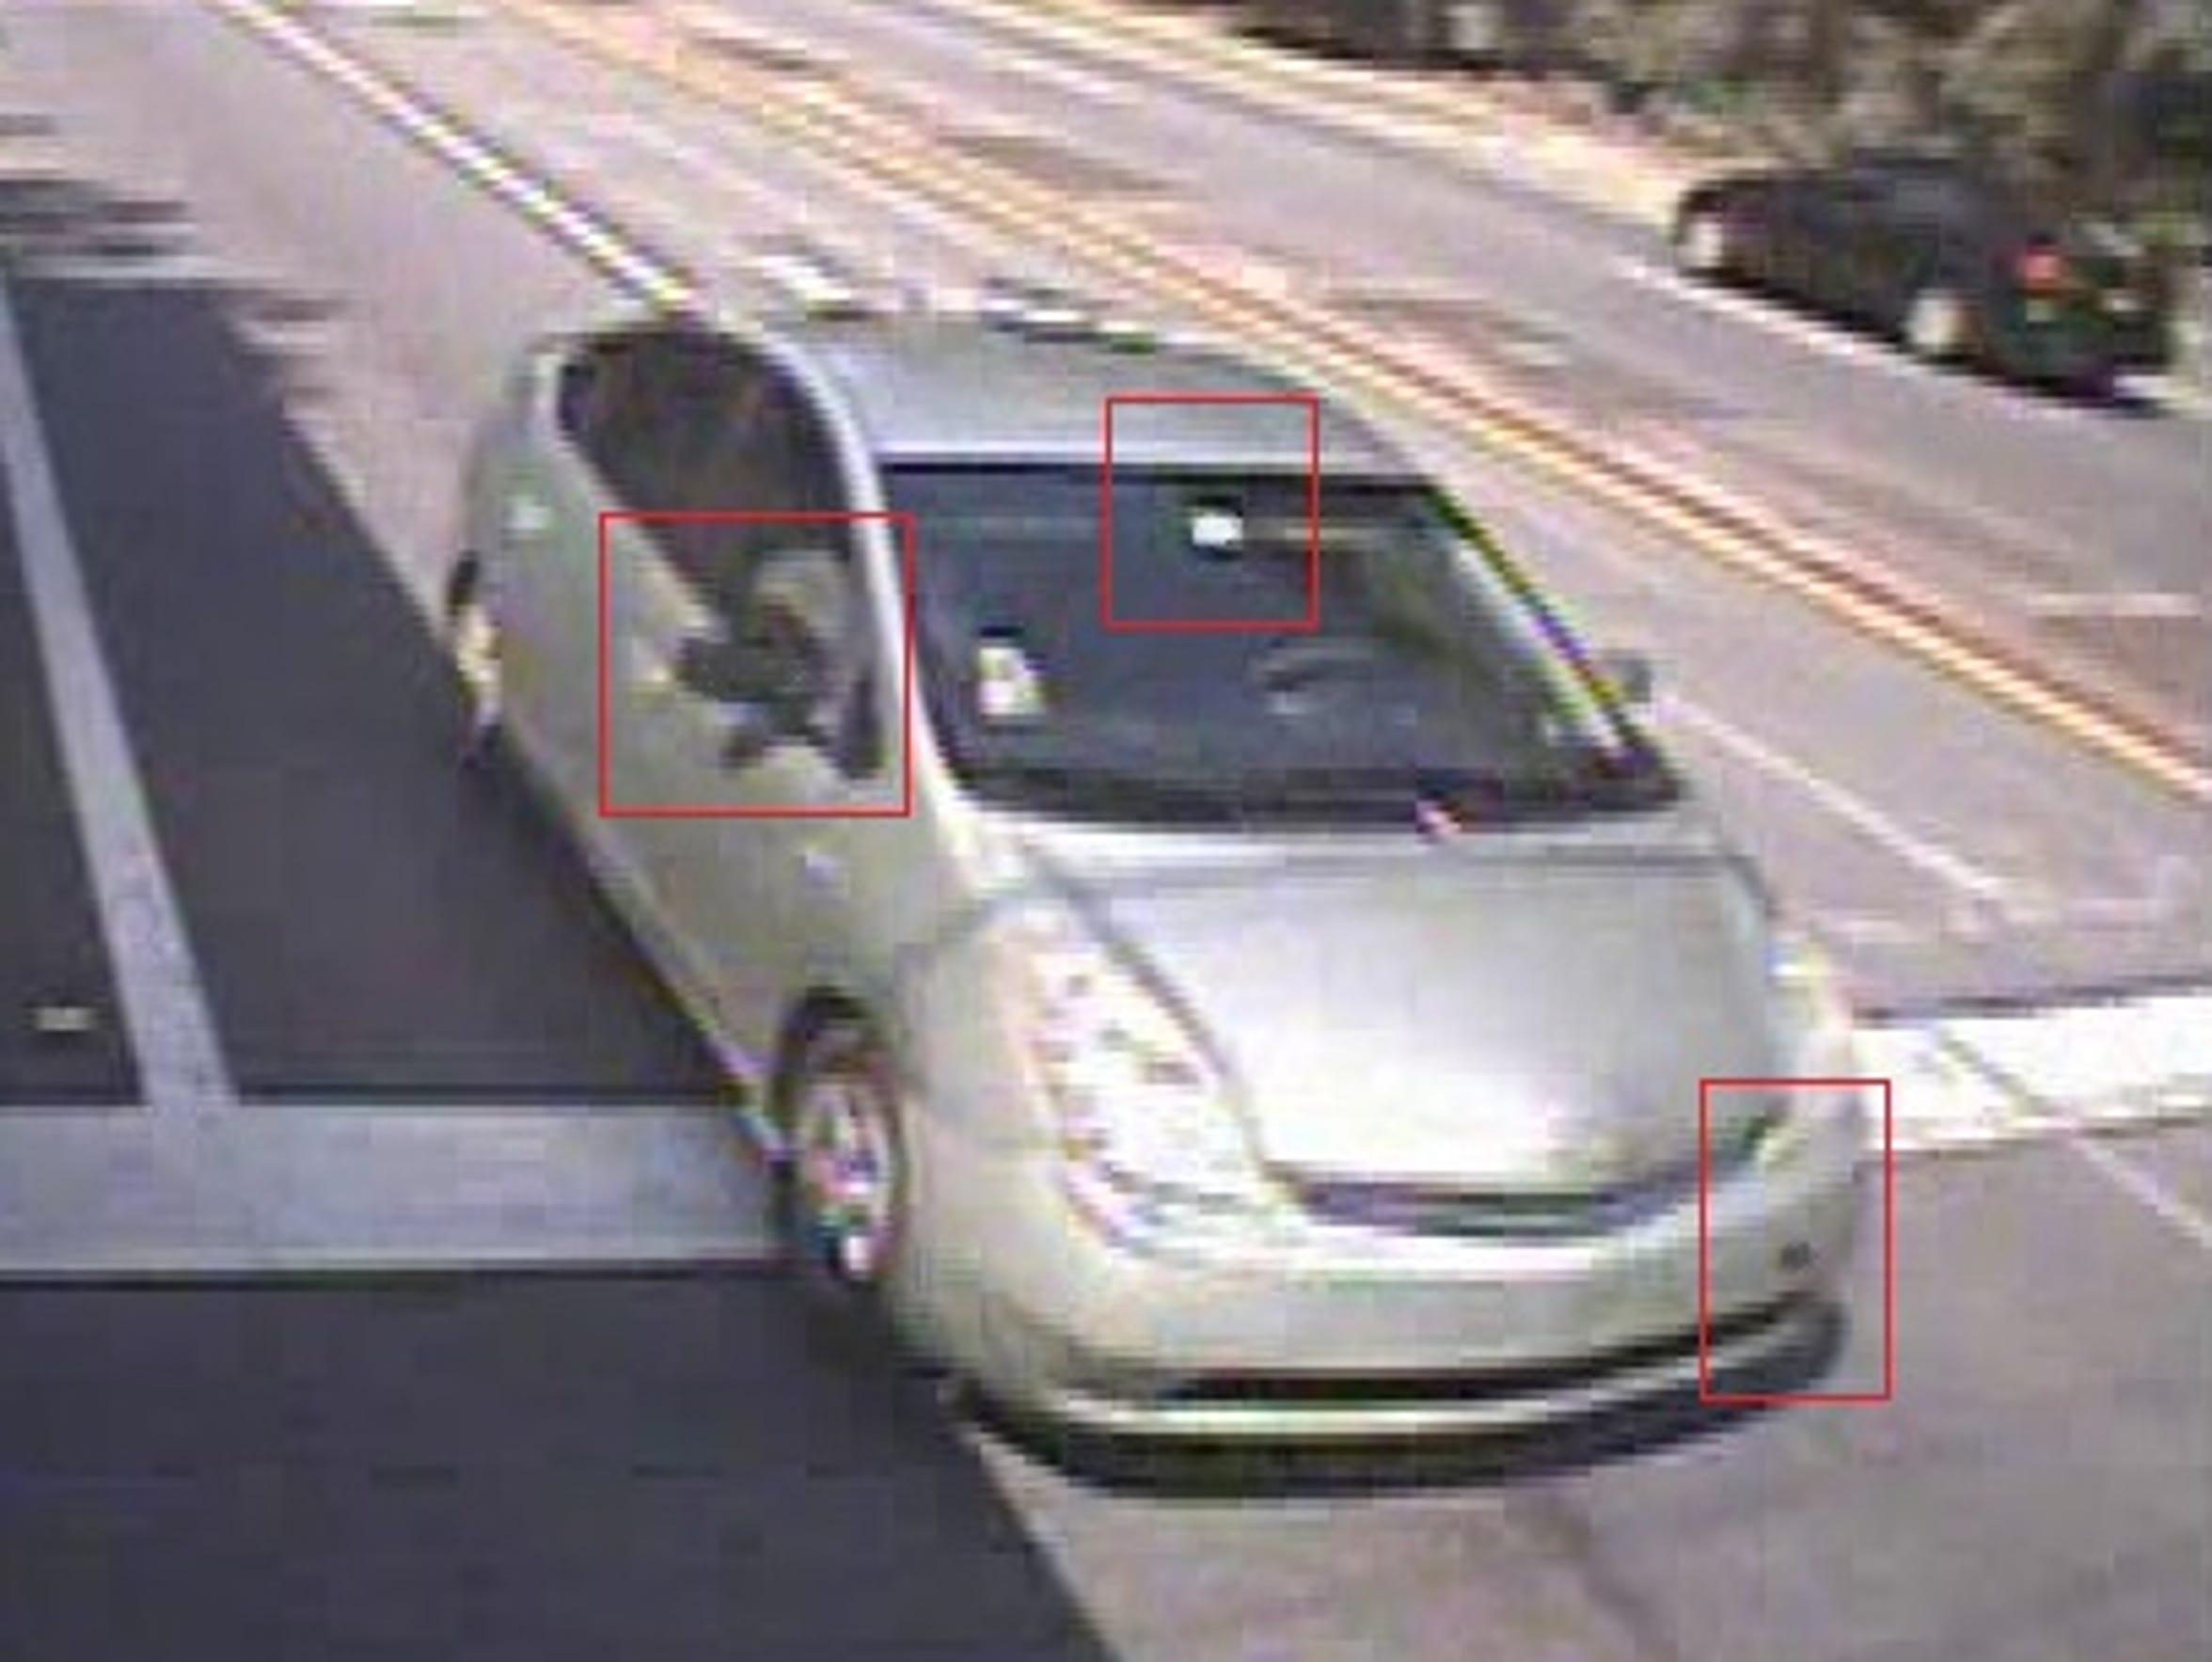 TPD officials say surveillance photos show the 2006-2009